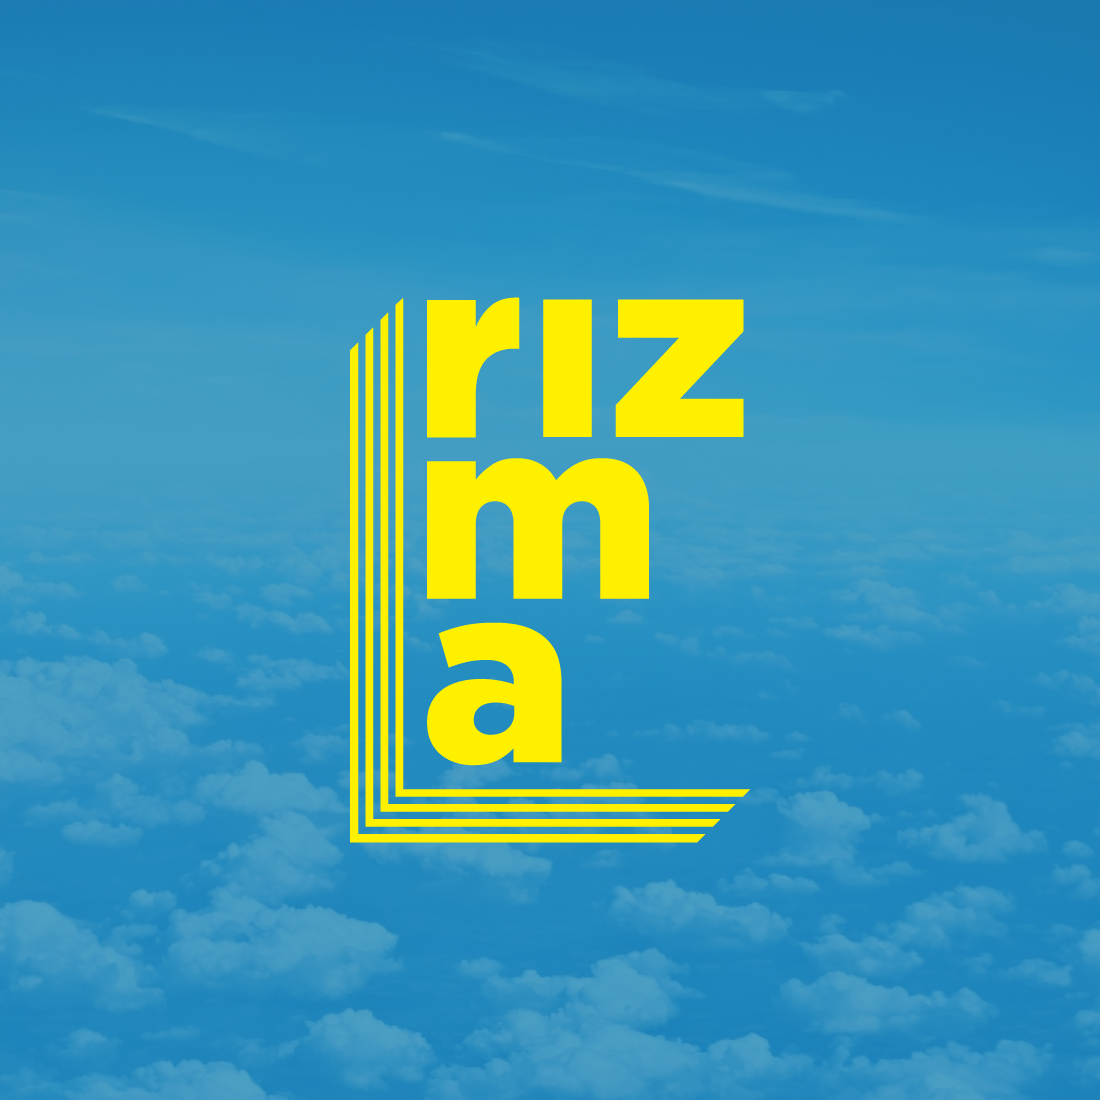 RIZMA